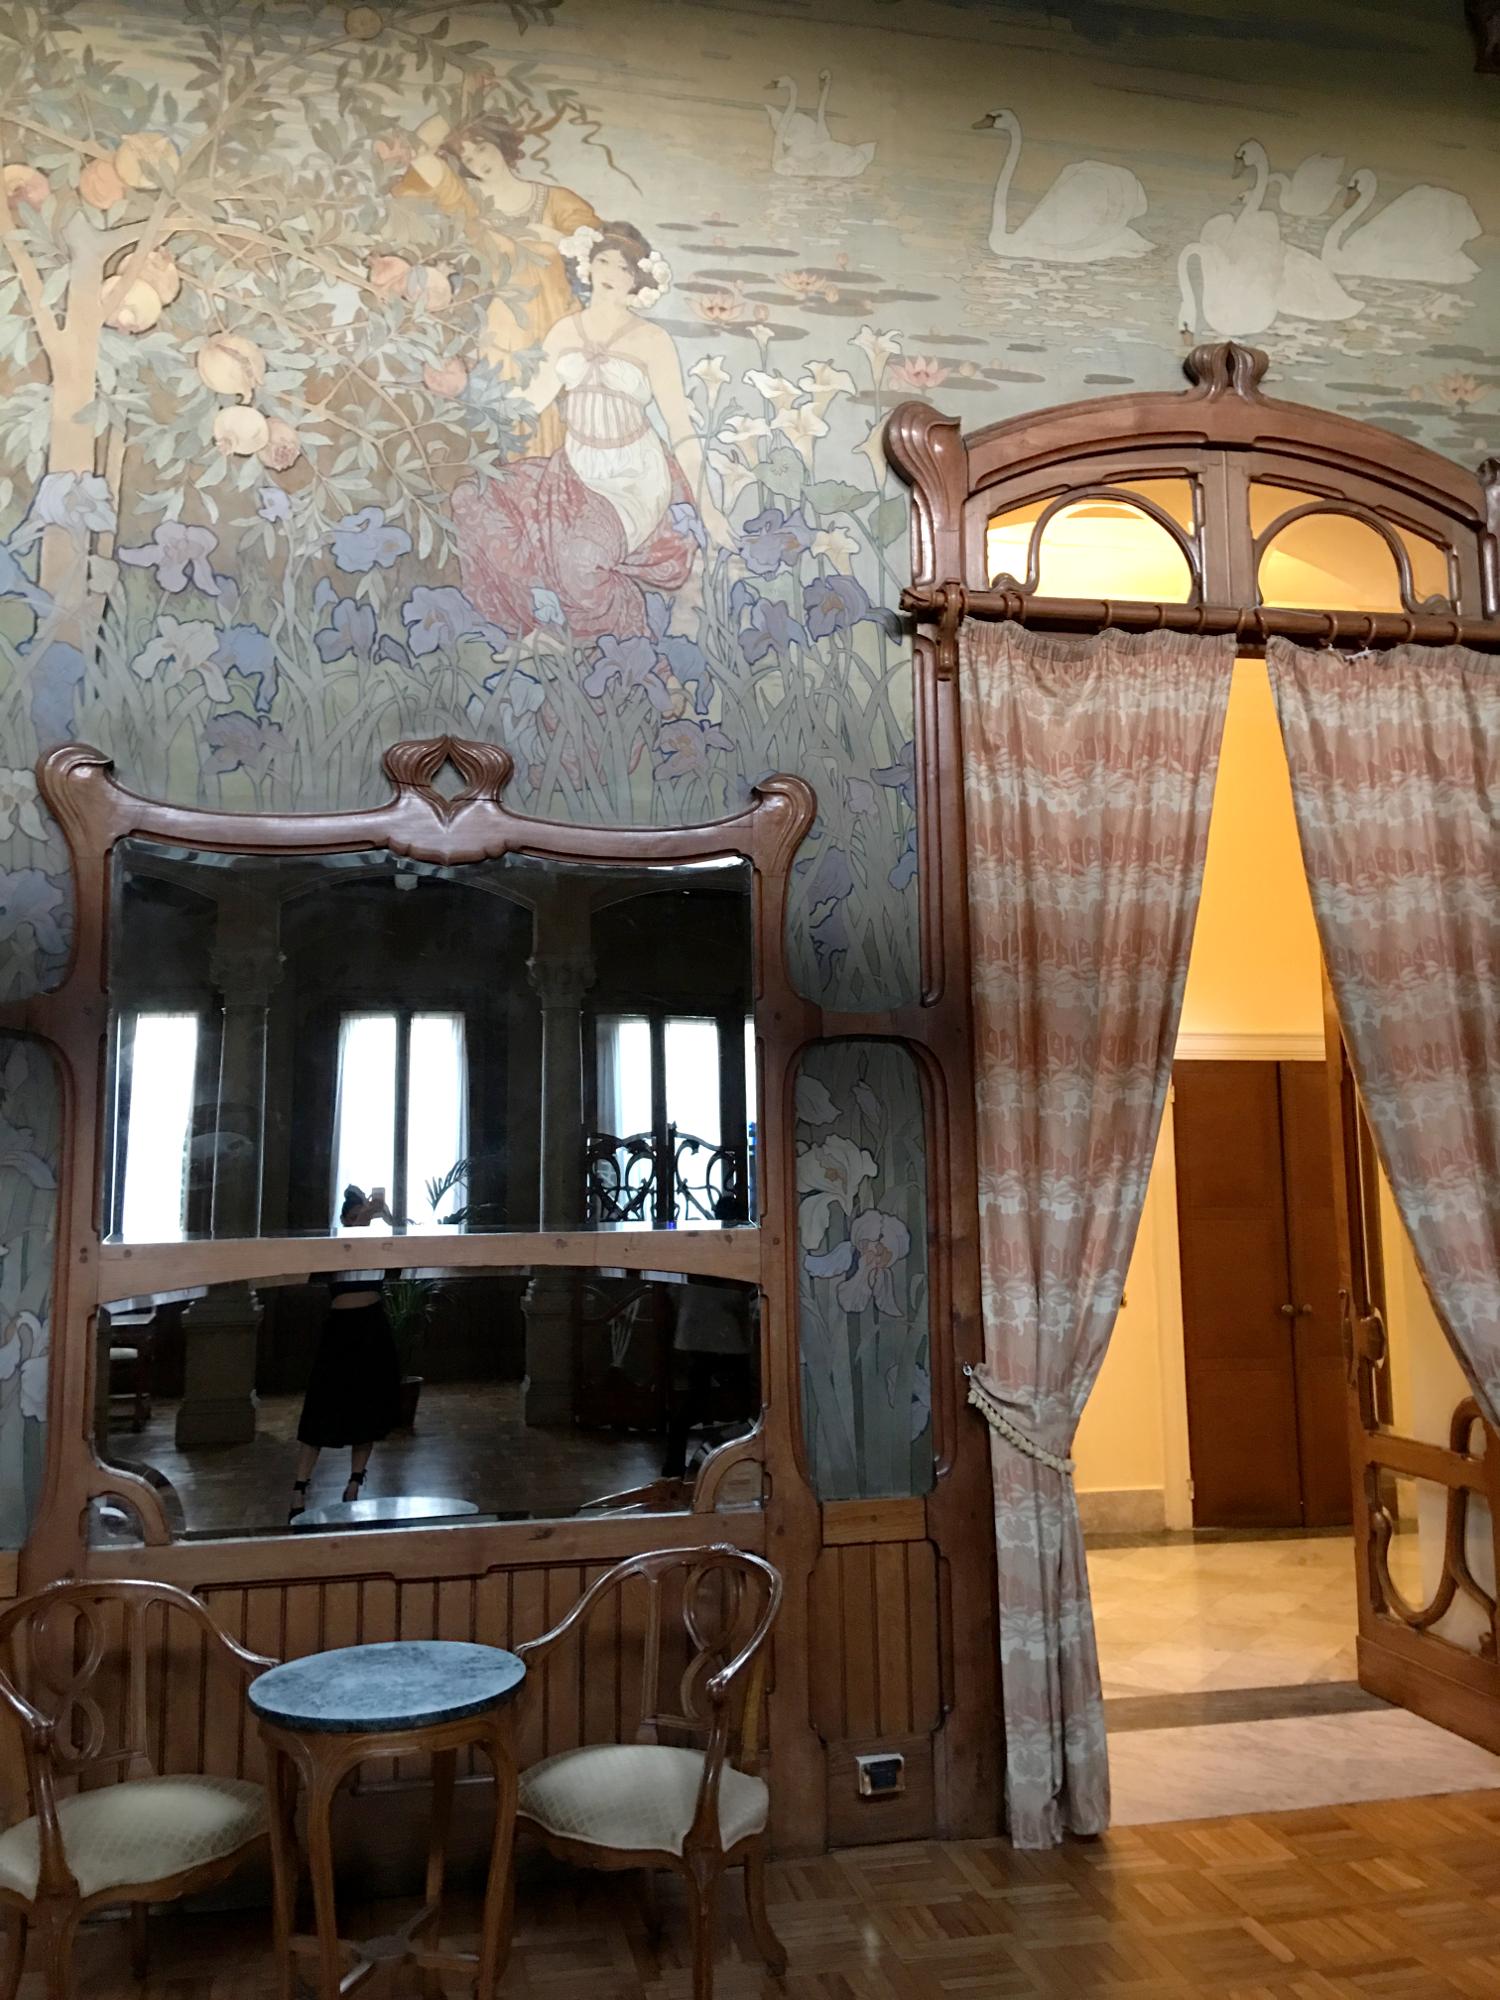 rocaille-blog-palermo-hotel-villa-igiea-liberty-8